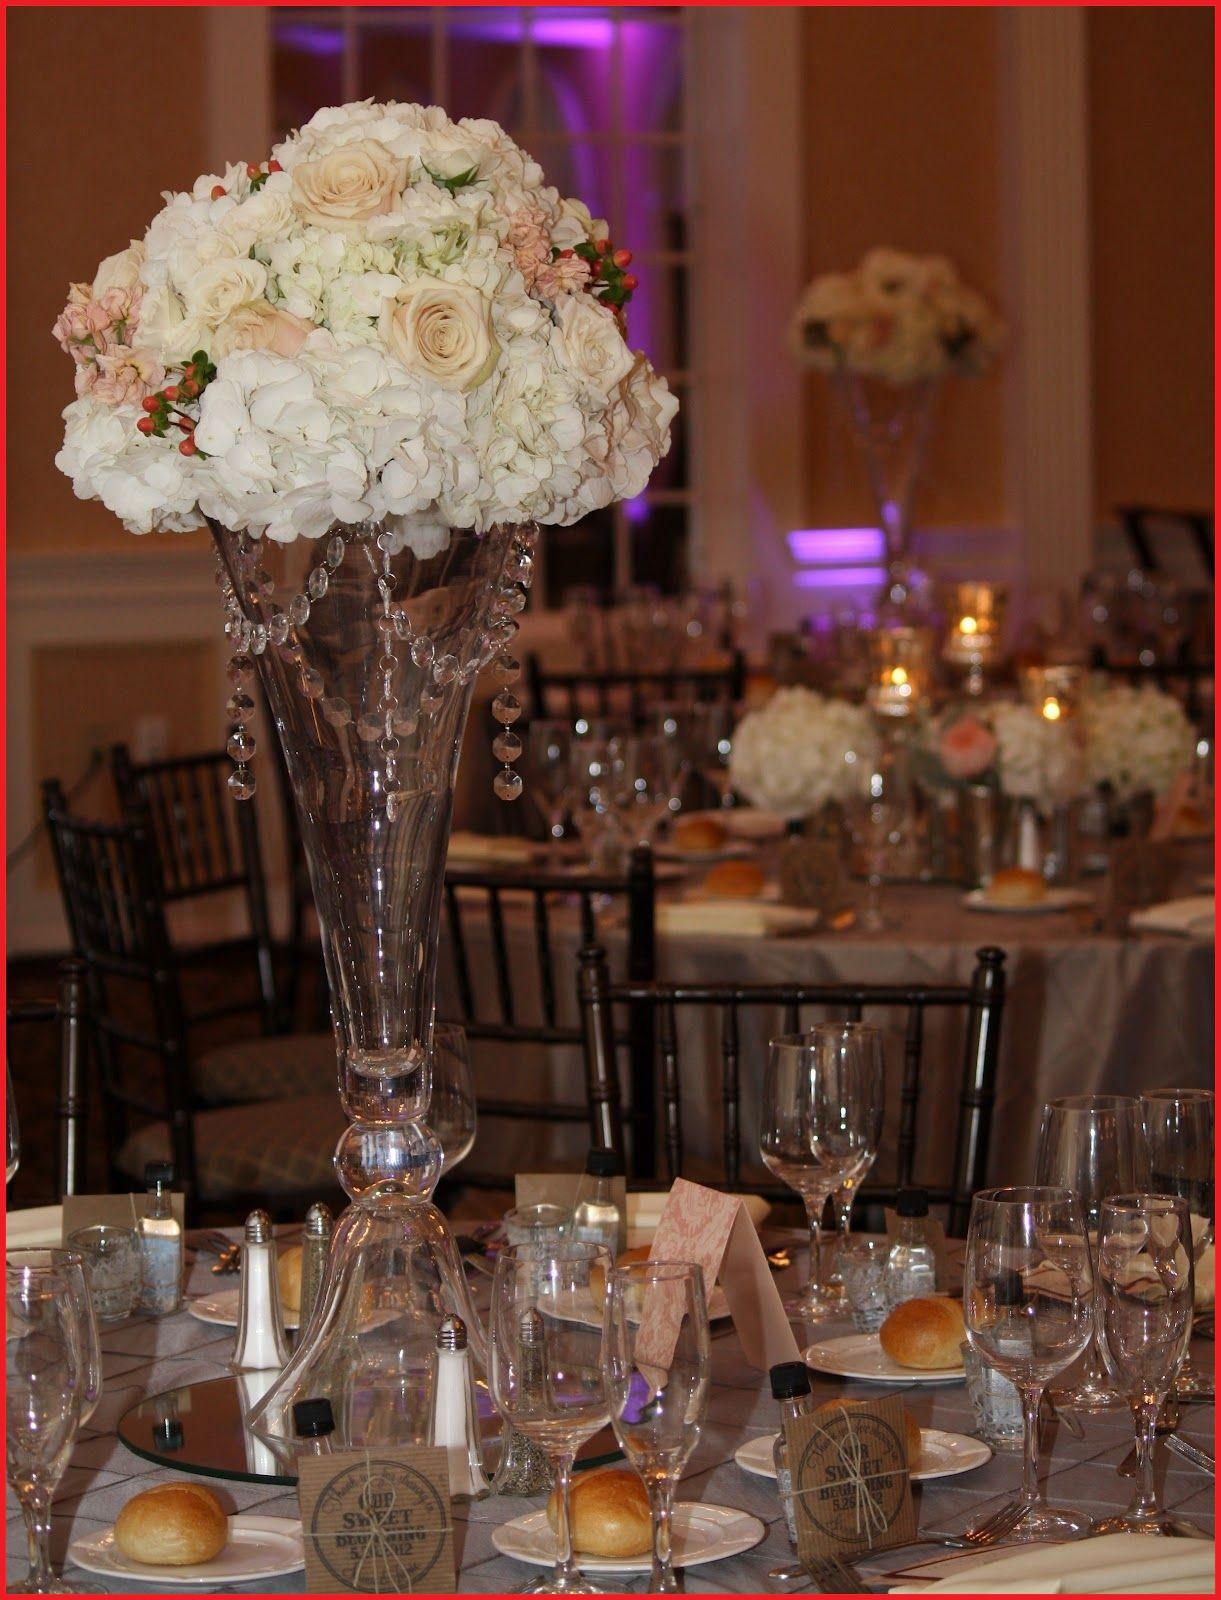 cheap trumpet vases wholesale of imagenes de cheap glass vases for wedding centerpieces for tall vases for wedding centerpieces cheap tall vases for wedding centerpieces cheap 9004 dorable tall glass